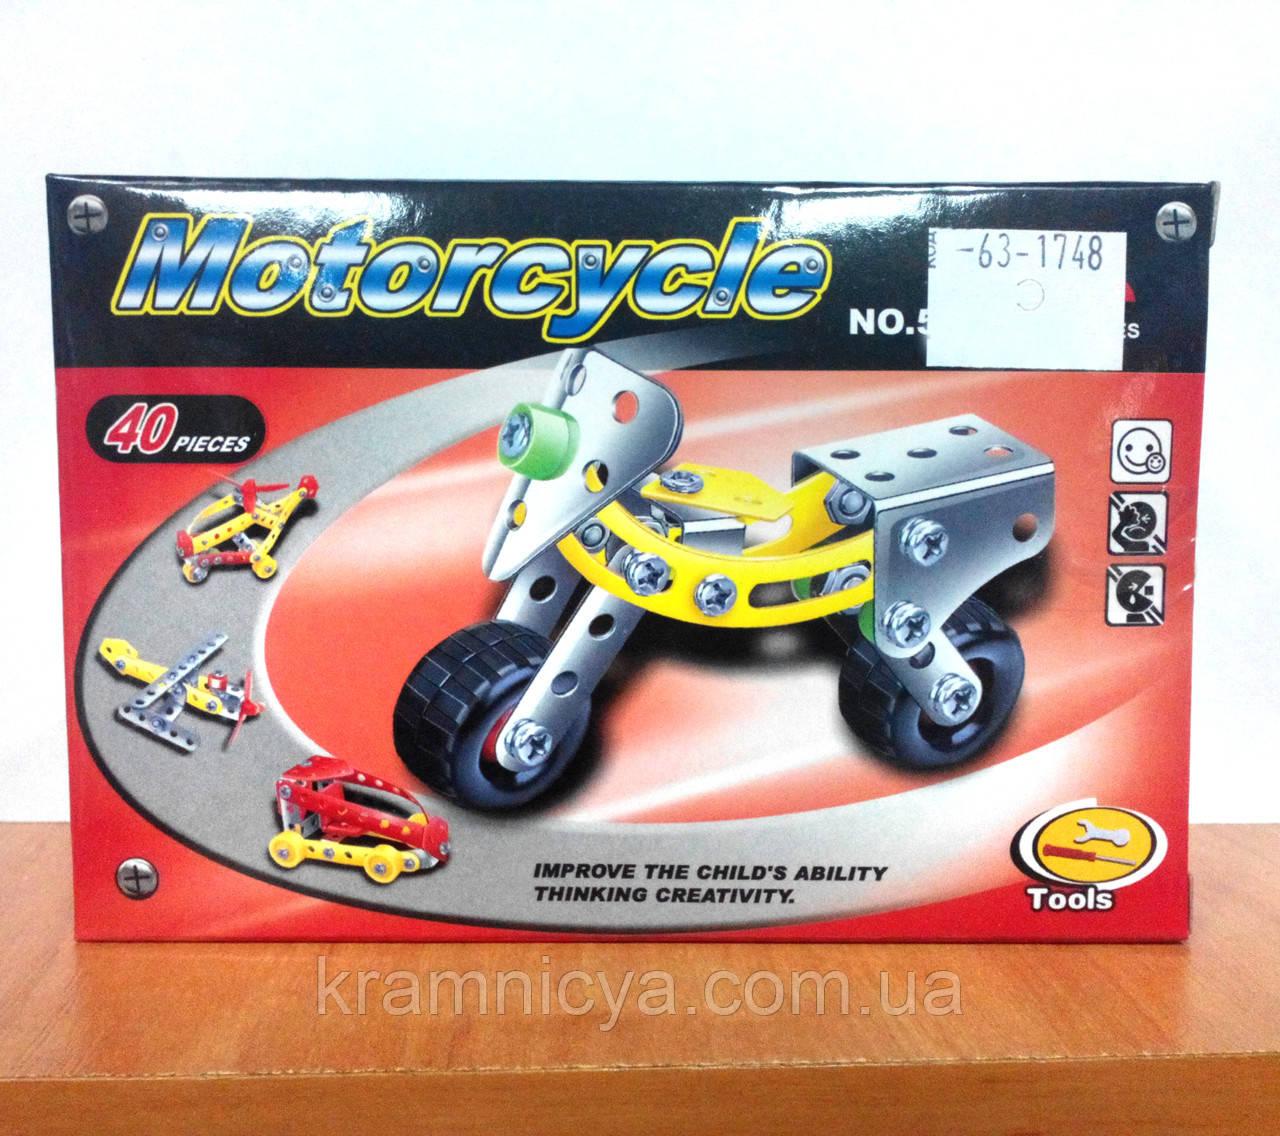 Конструктор металлический, Мотоцикл, арт.: 529-19